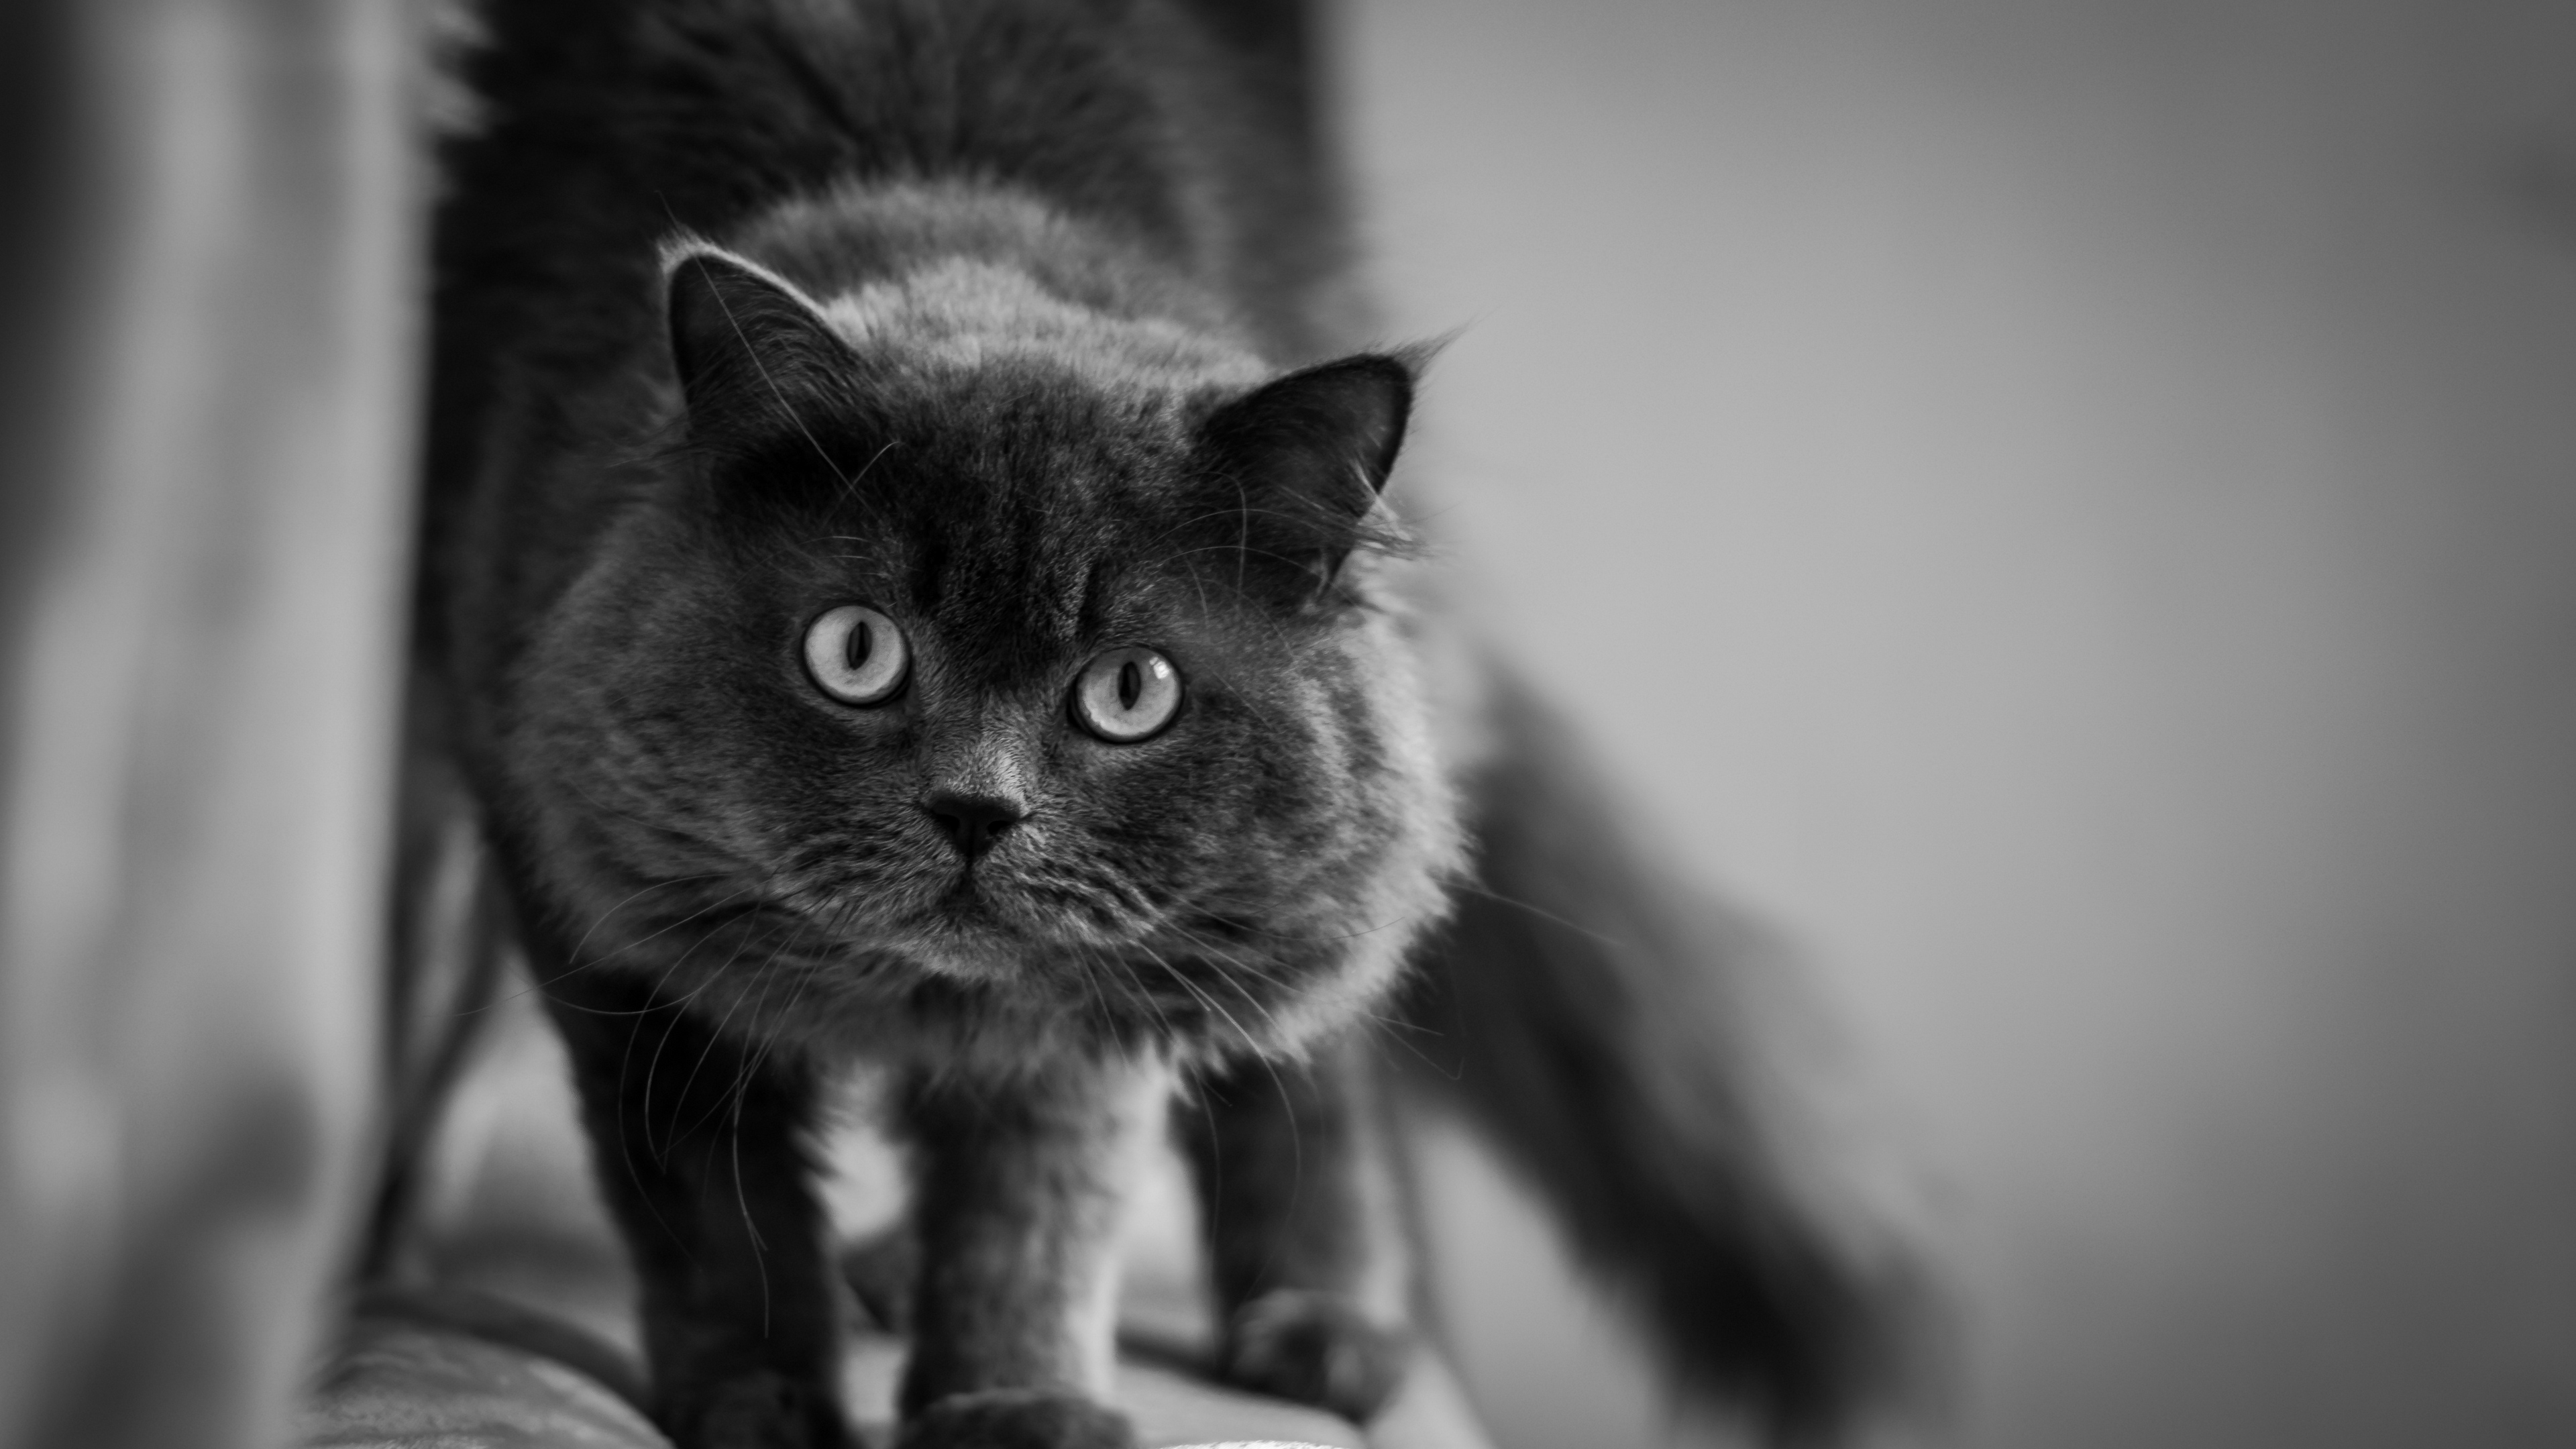 cat muzzle fluffy eyes bw 4k 1542241965 - cat, muzzle, fluffy, eyes, bw 4k - muzzle, fluffy, Cat